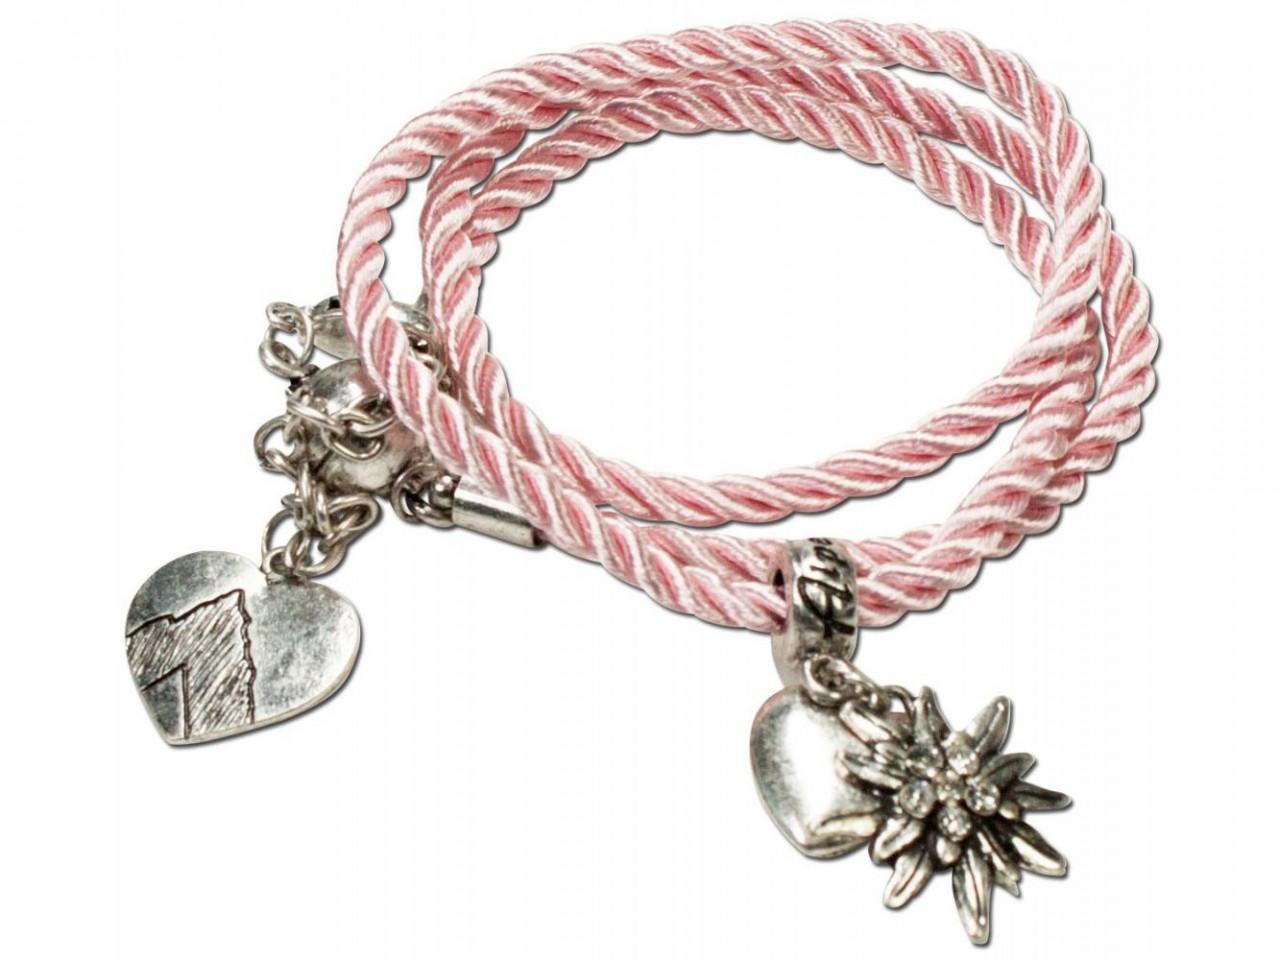 Bracelet à cordon edelweiss rose clair